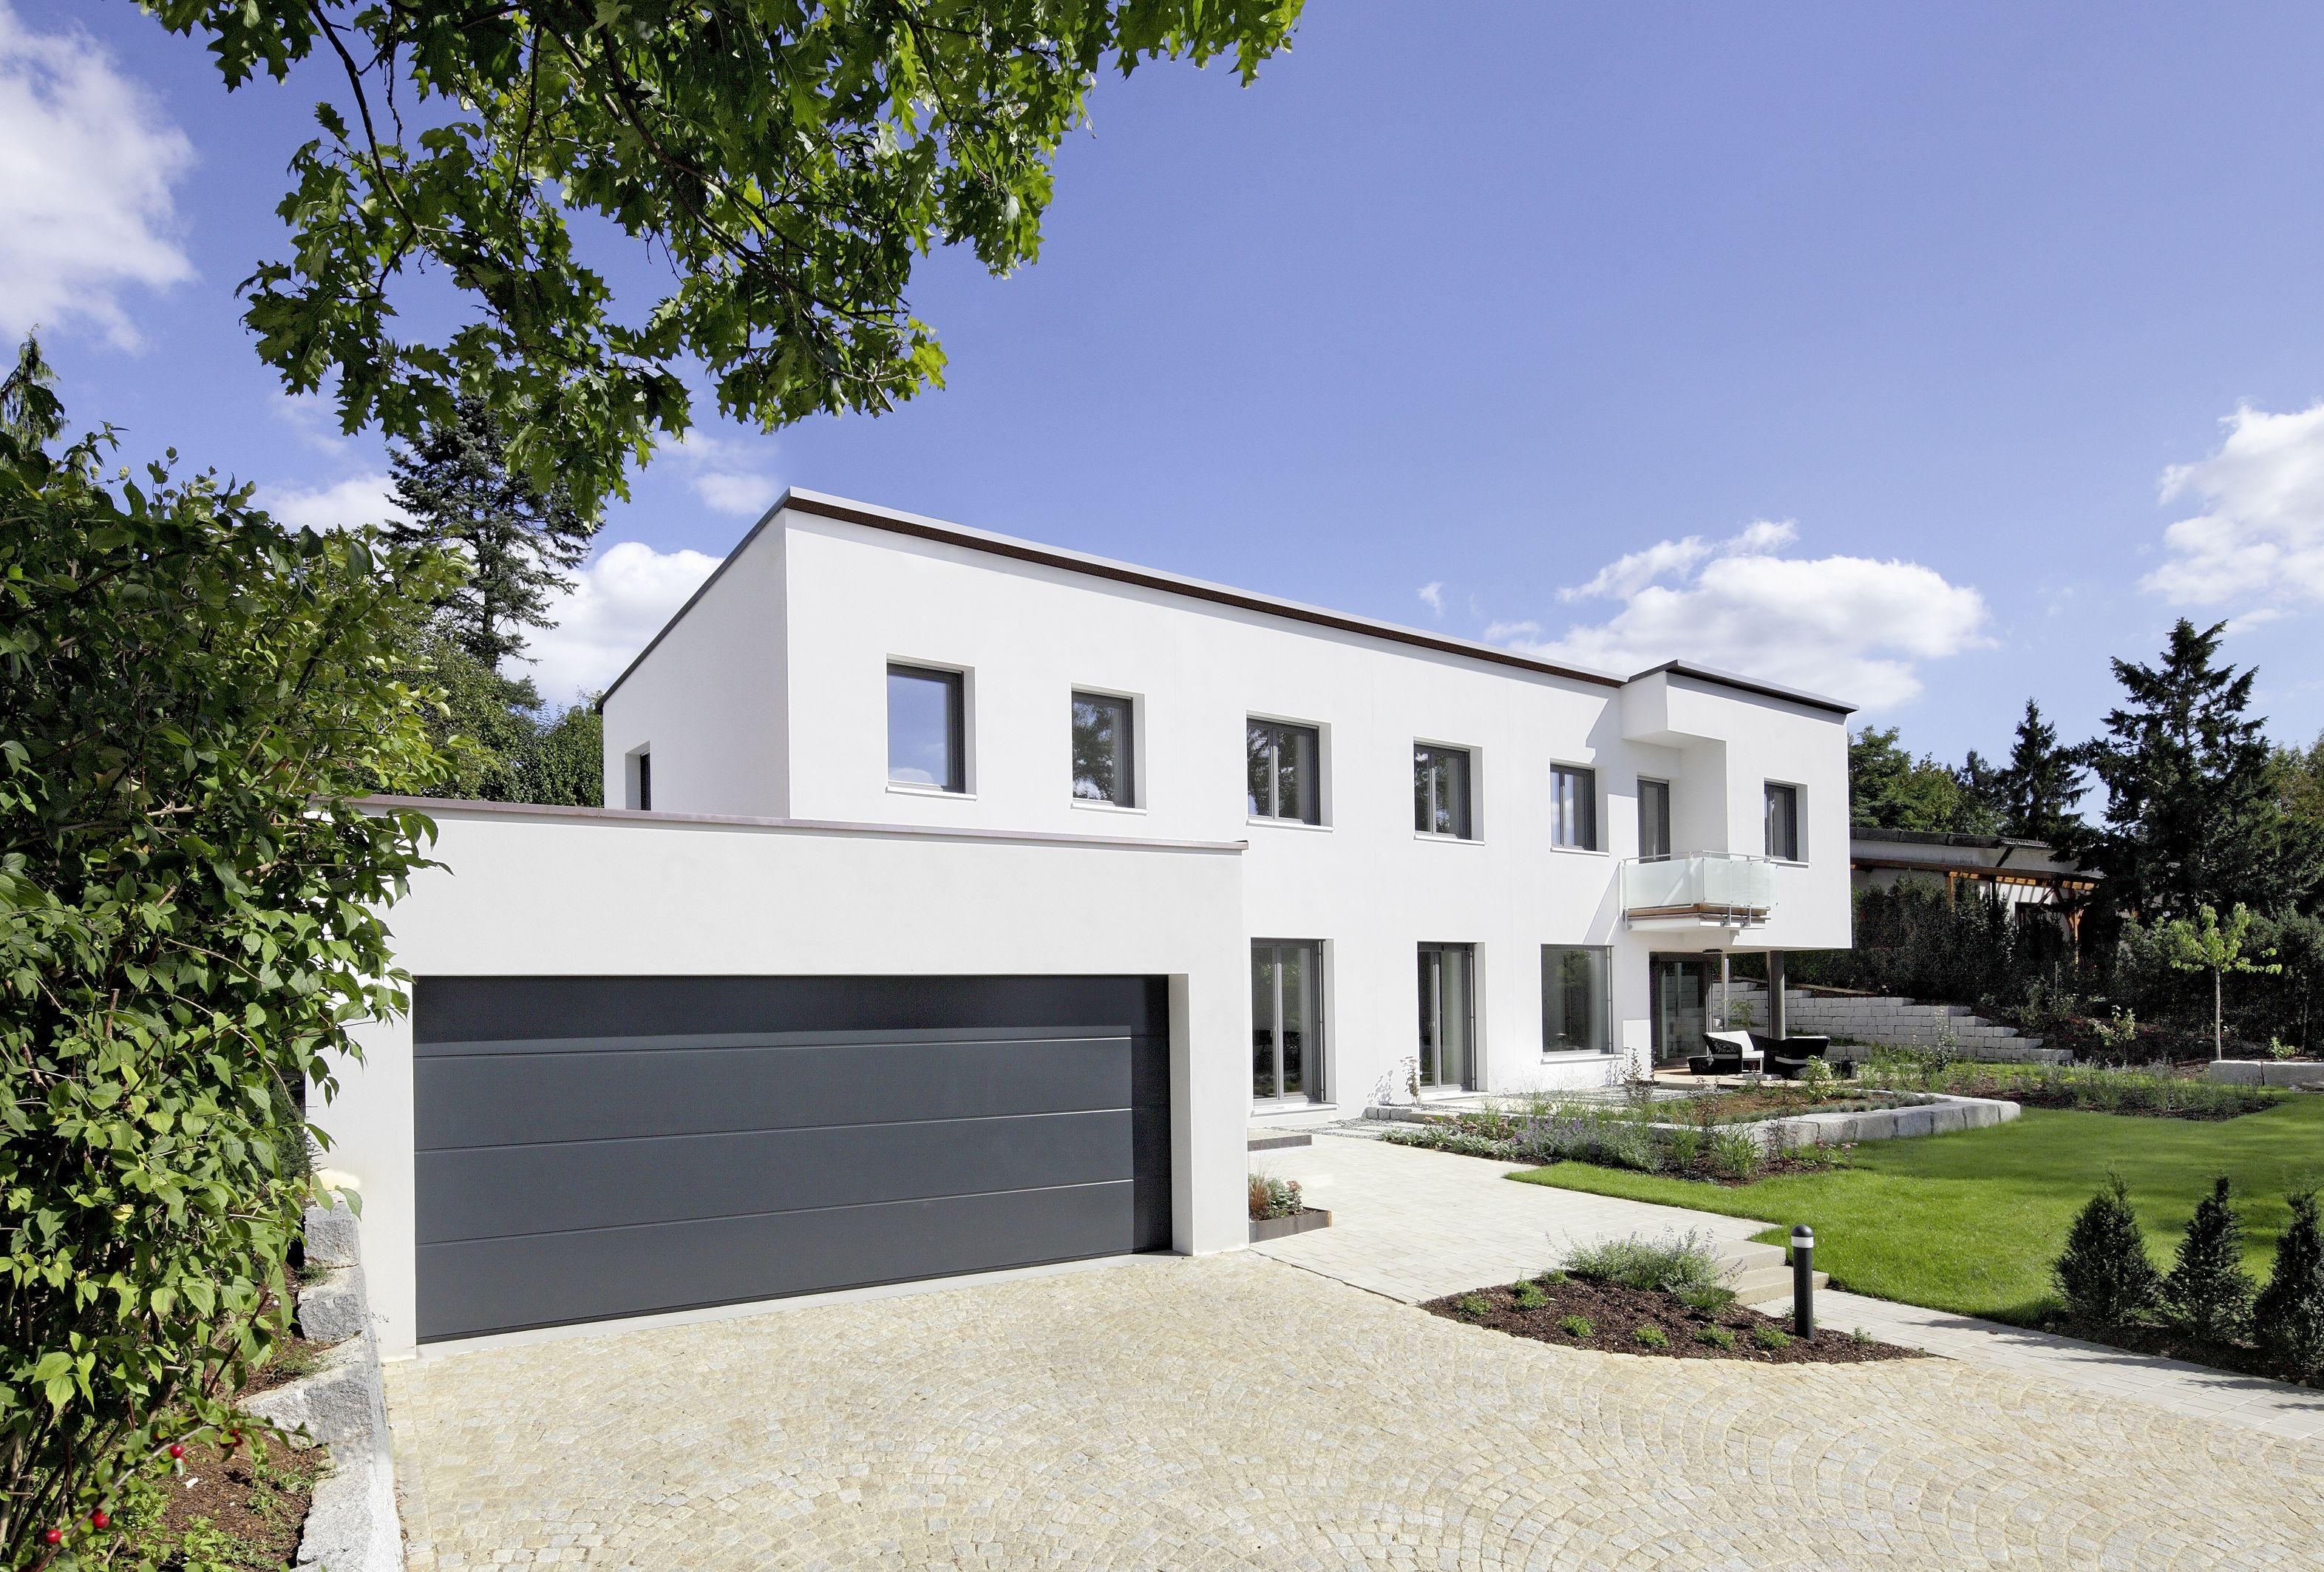 Foto: Massiv mein Haus/KS-Bayern